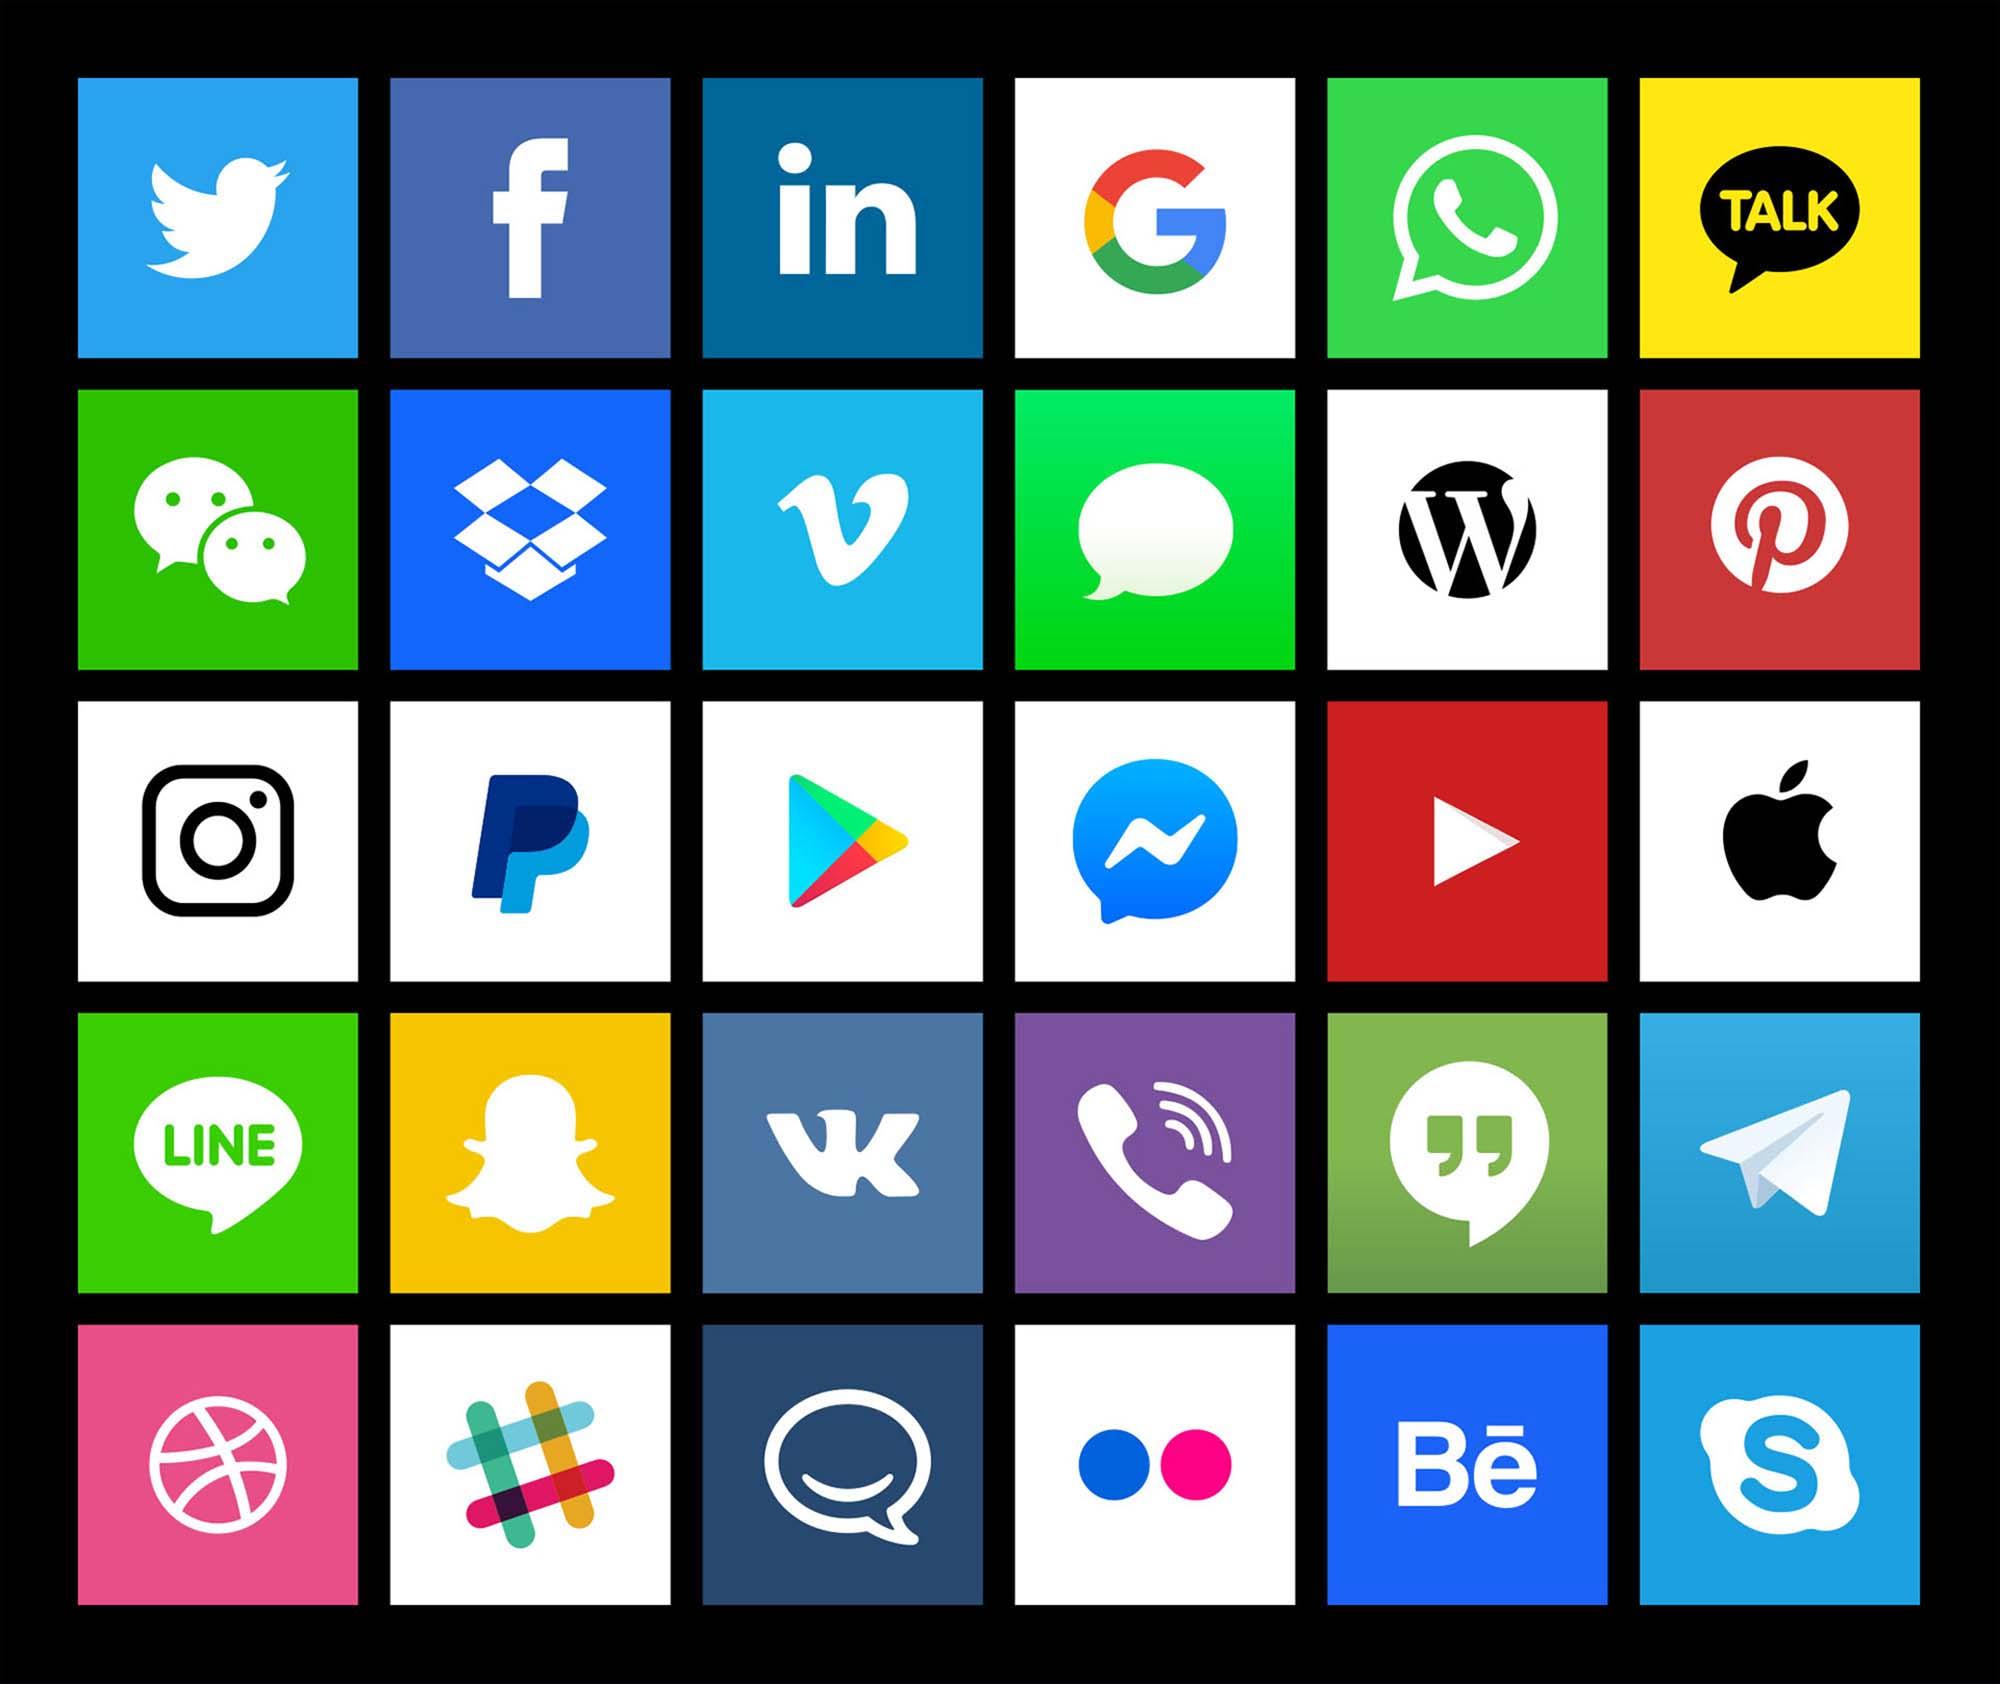 Social Media Vector Icons 2